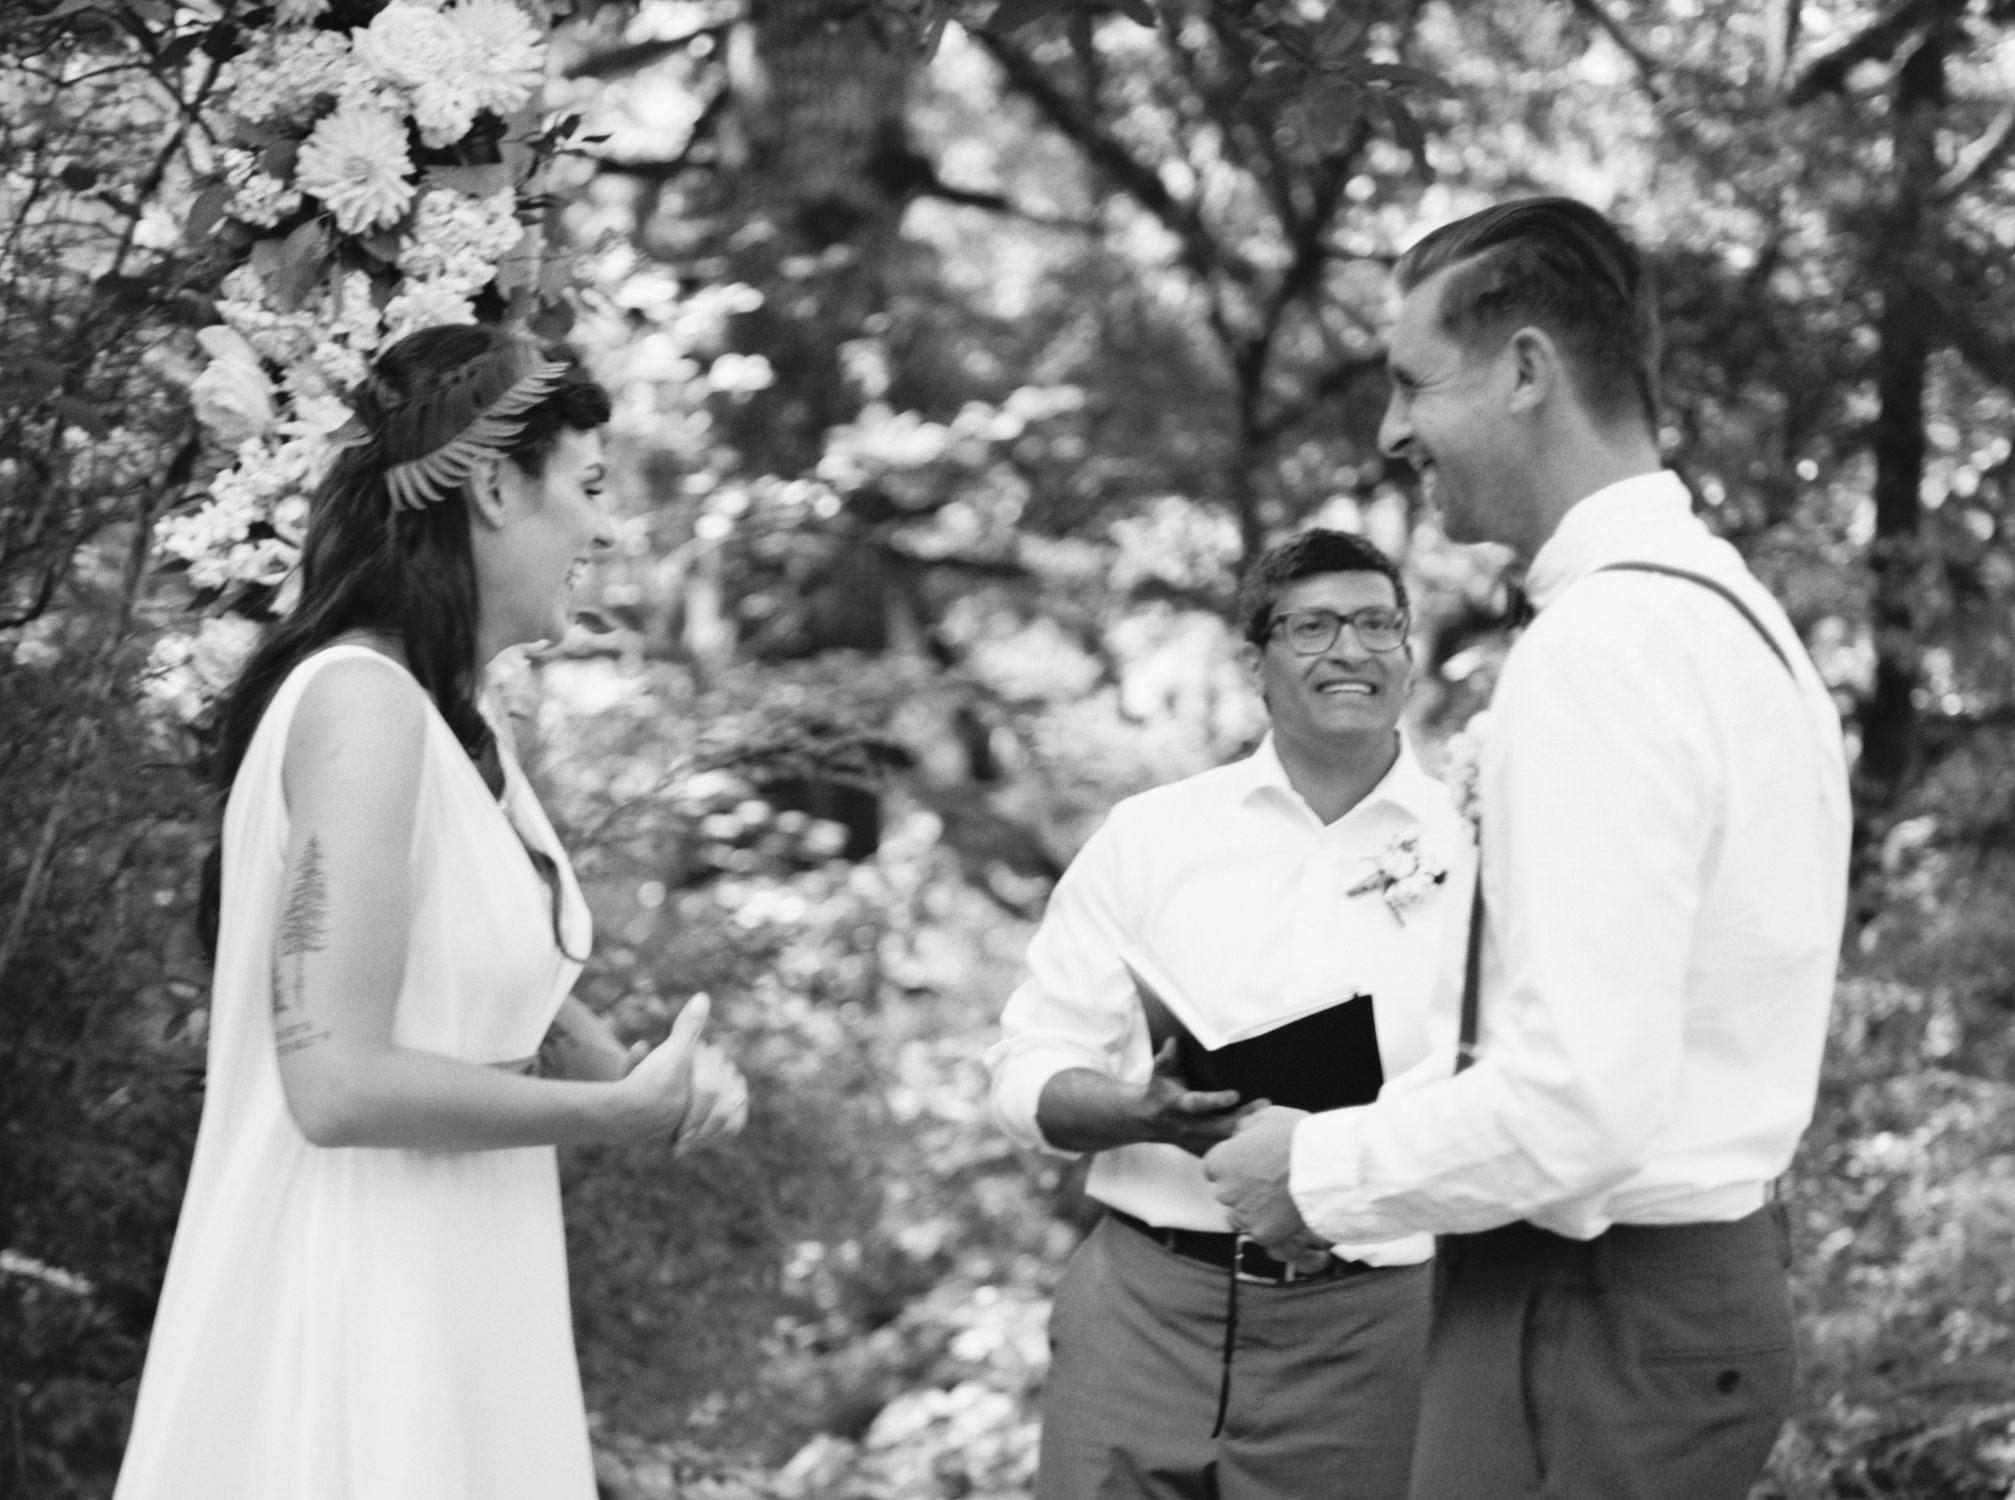 Couple saying wedding vowes